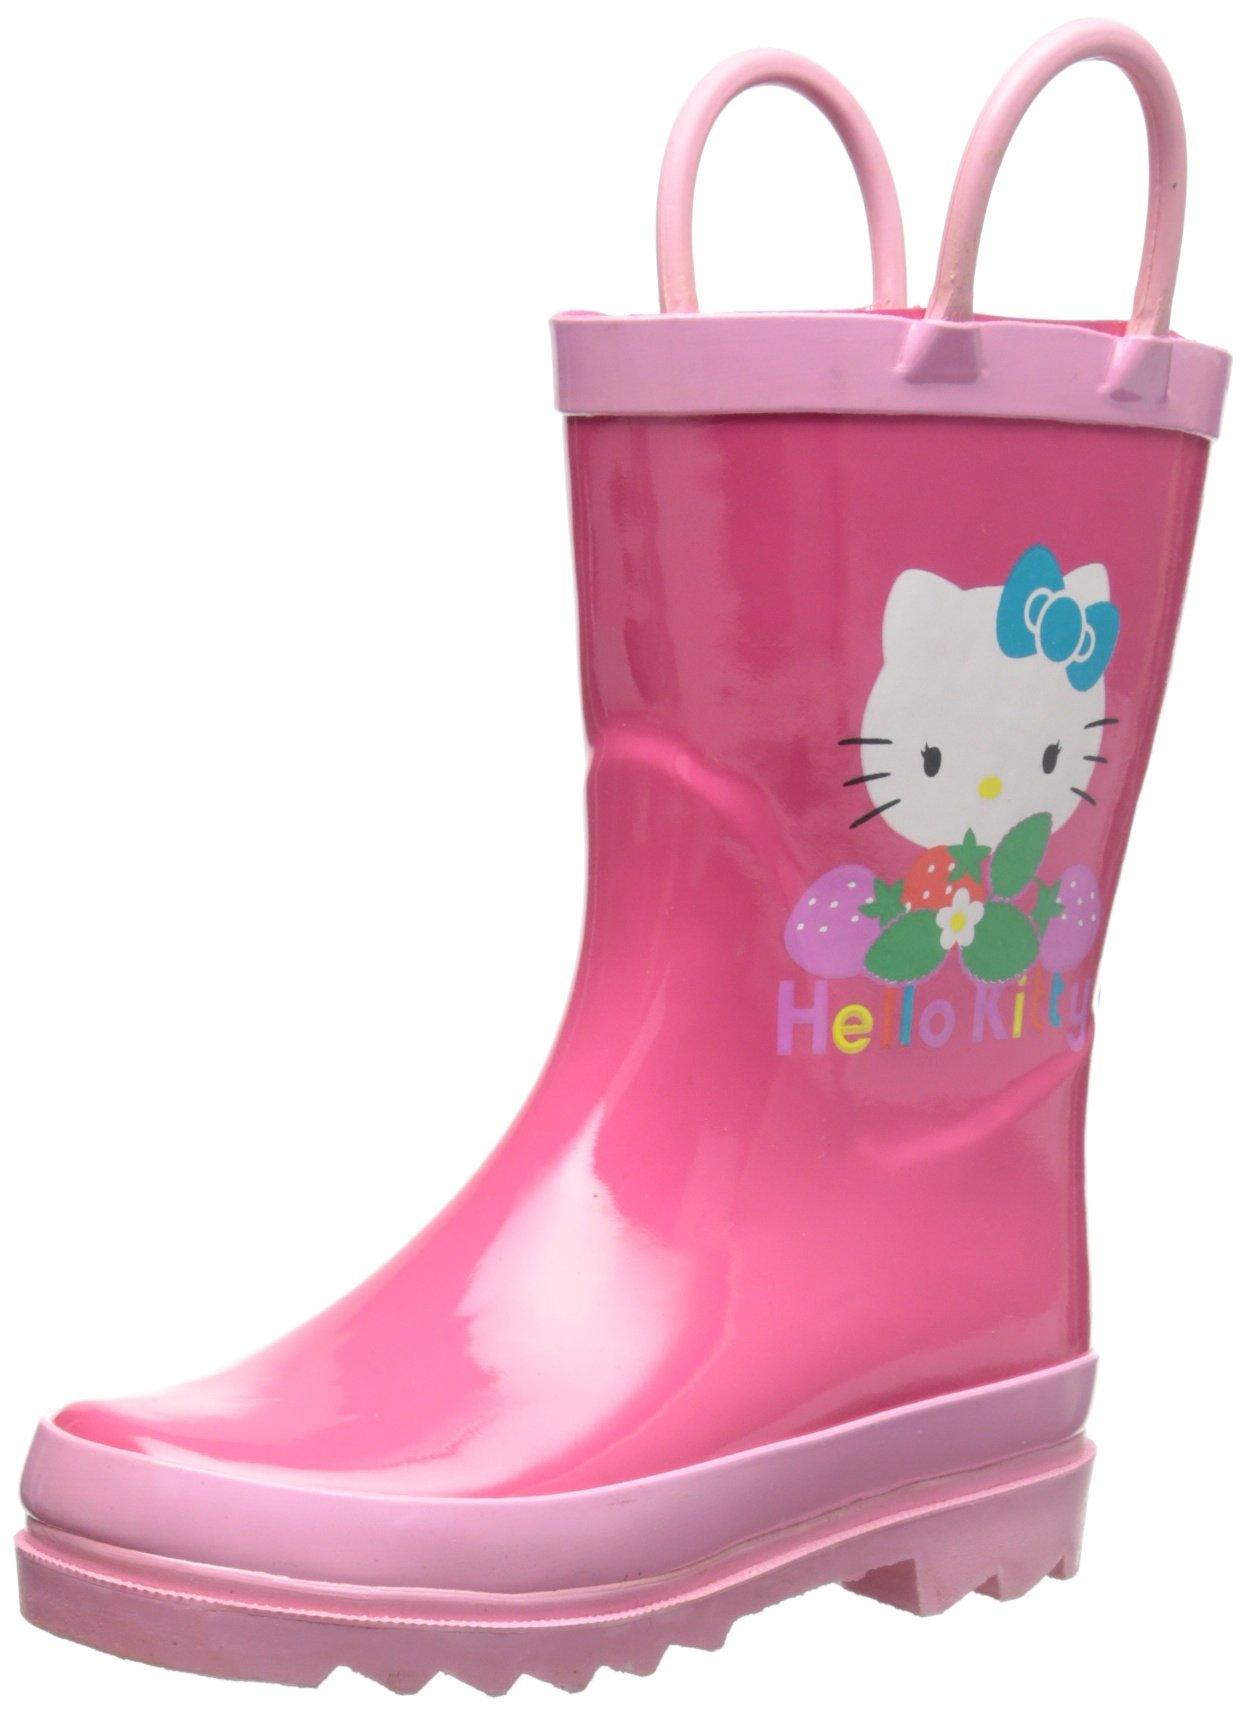 Sanrio Hello Kitty Girl's Pink Rain Boots (Toddler/Little Kid) (9 M US Toddler)